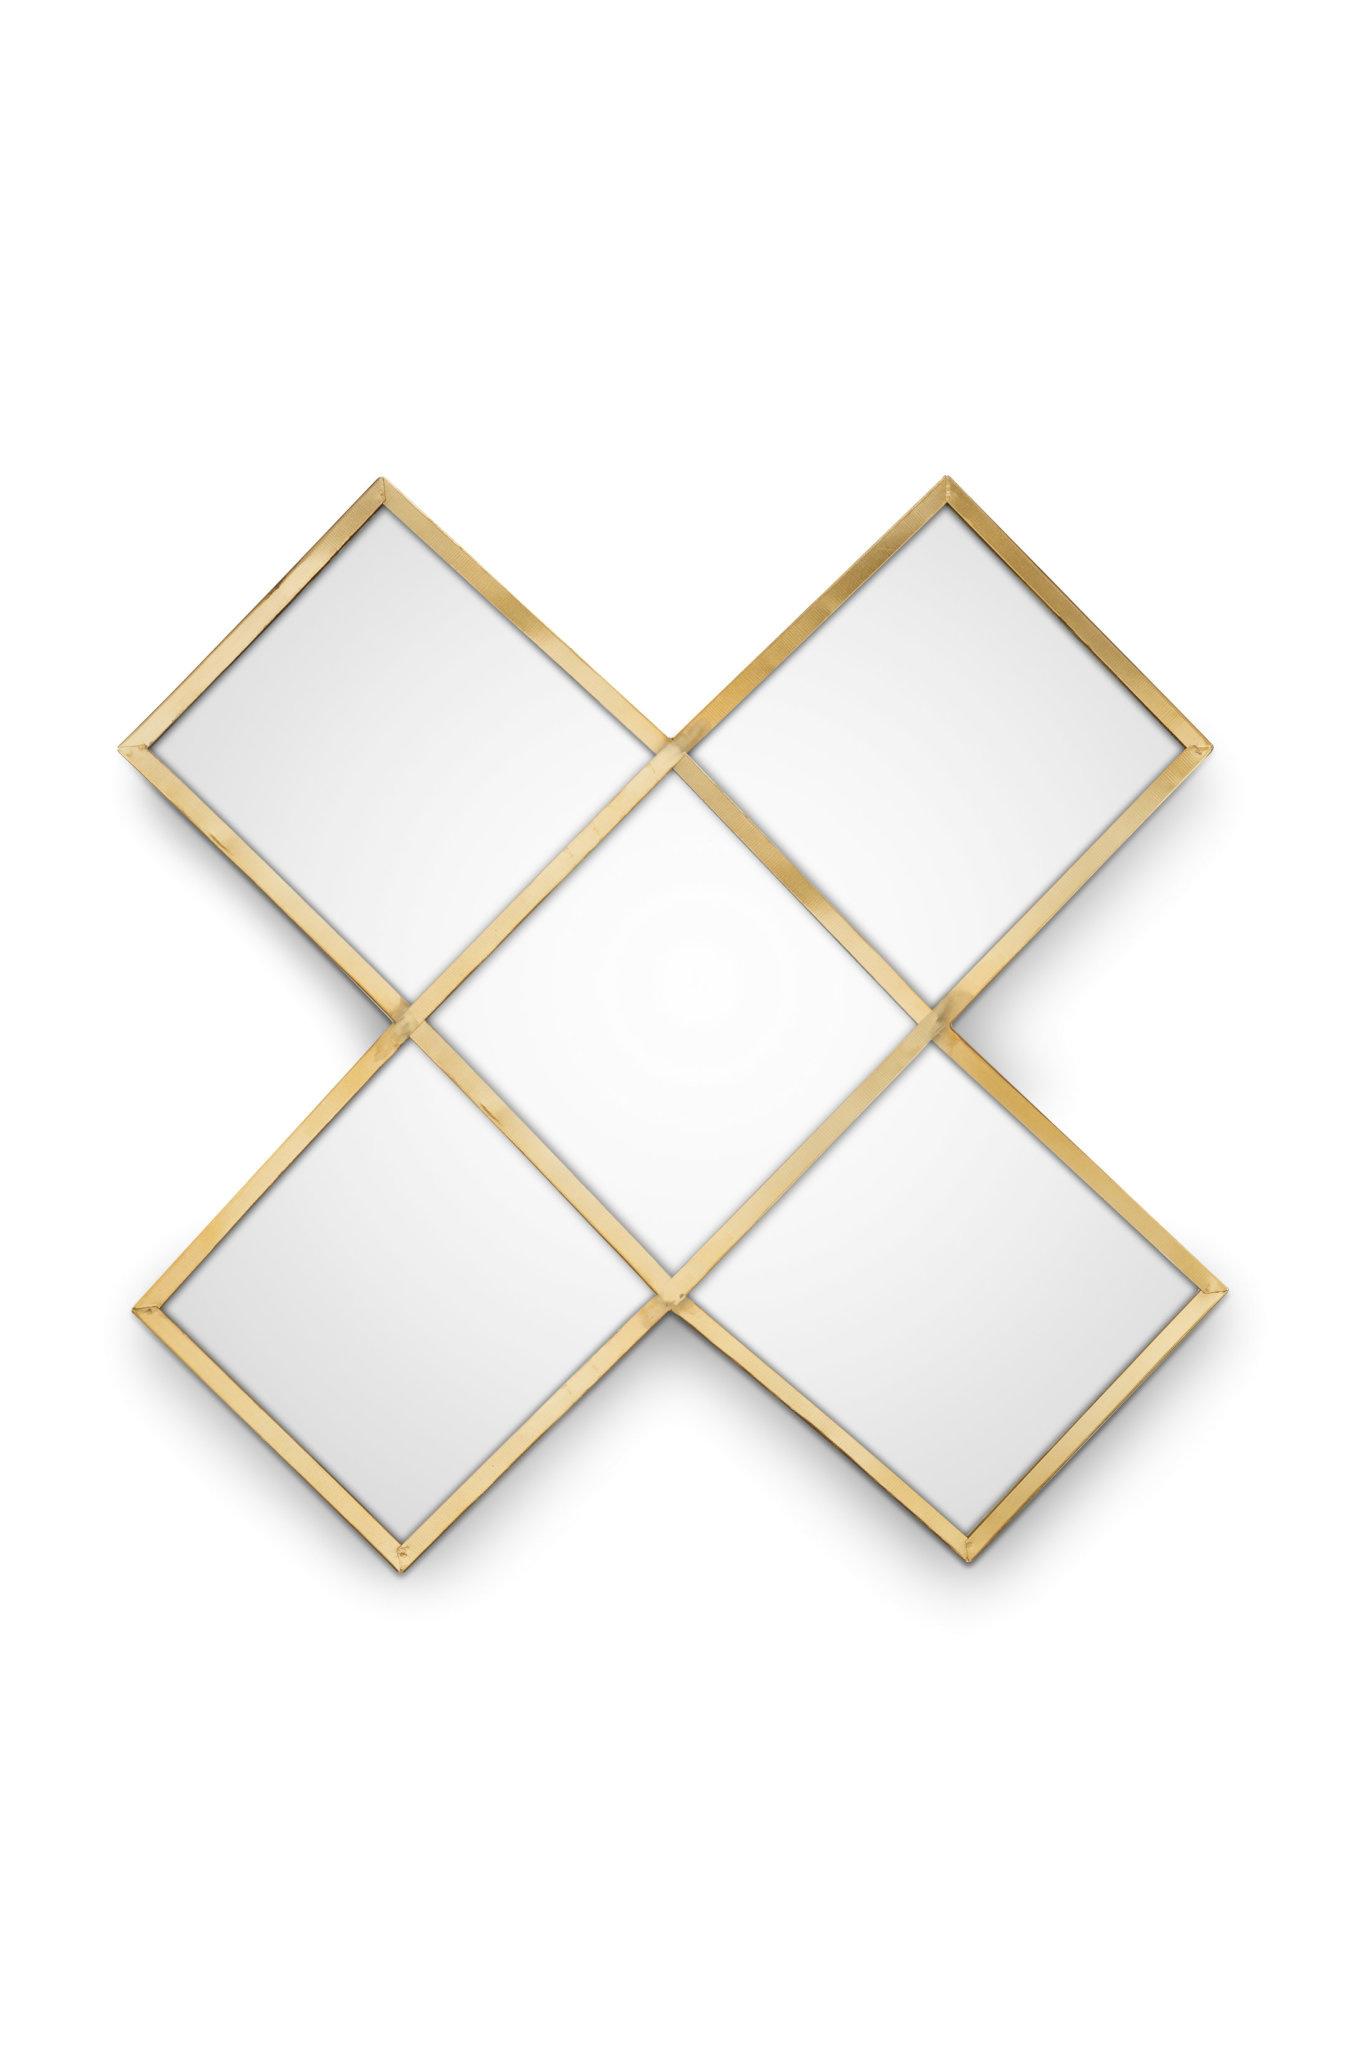 VtWonen Woonaccessoires VT WonenMirror Cross Gold 45cm